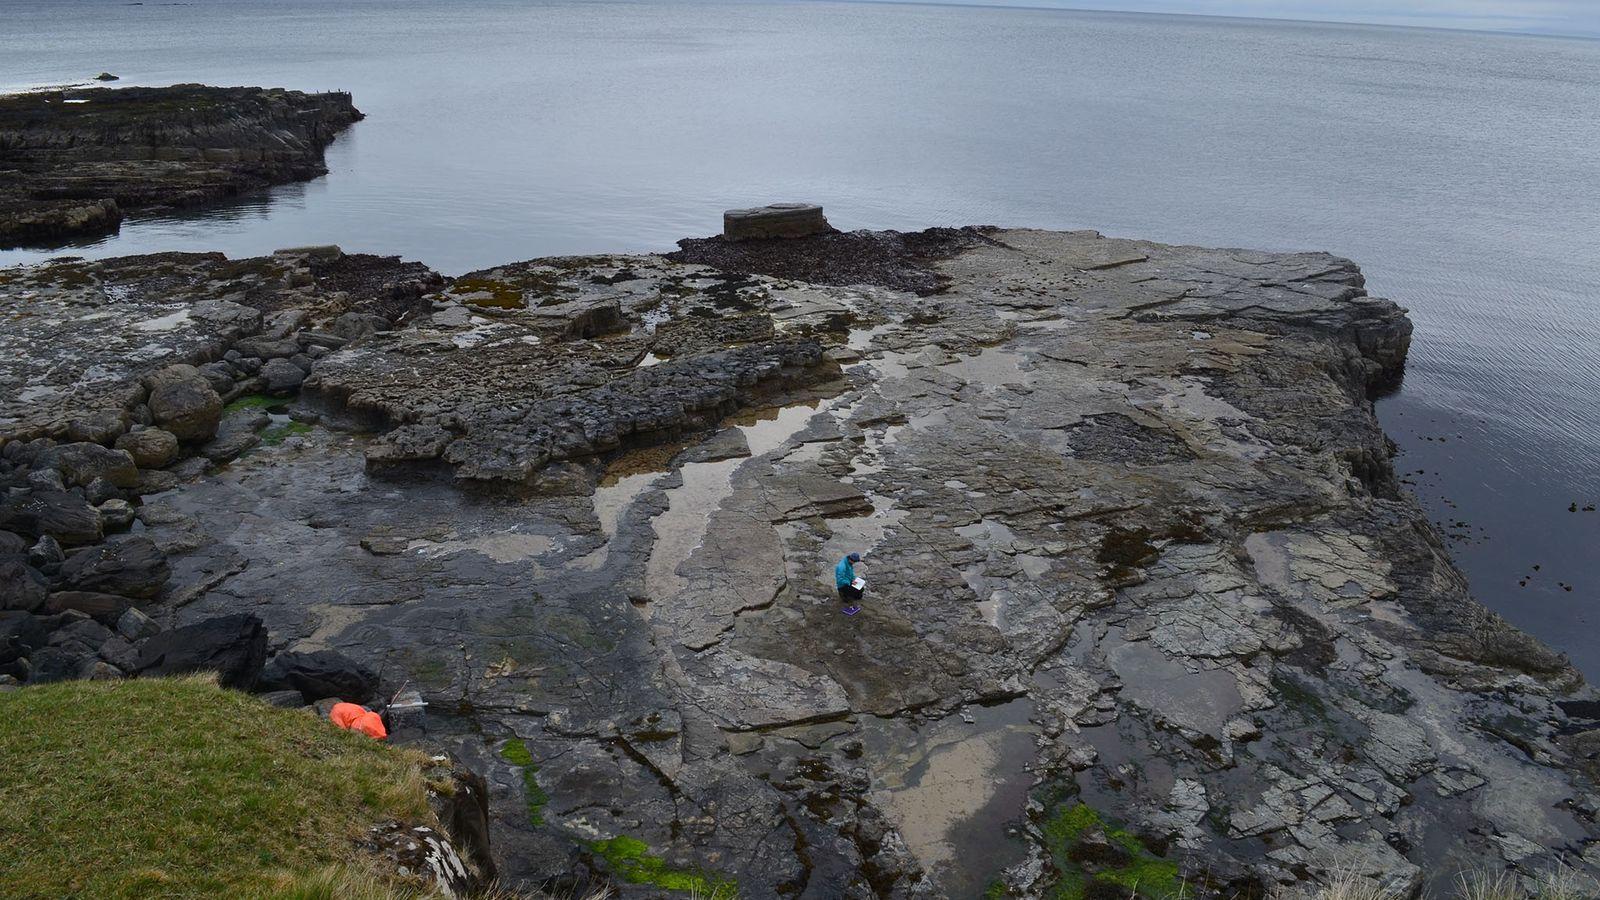 Panorâmica da zona principal onde foram descobertas as pegadas